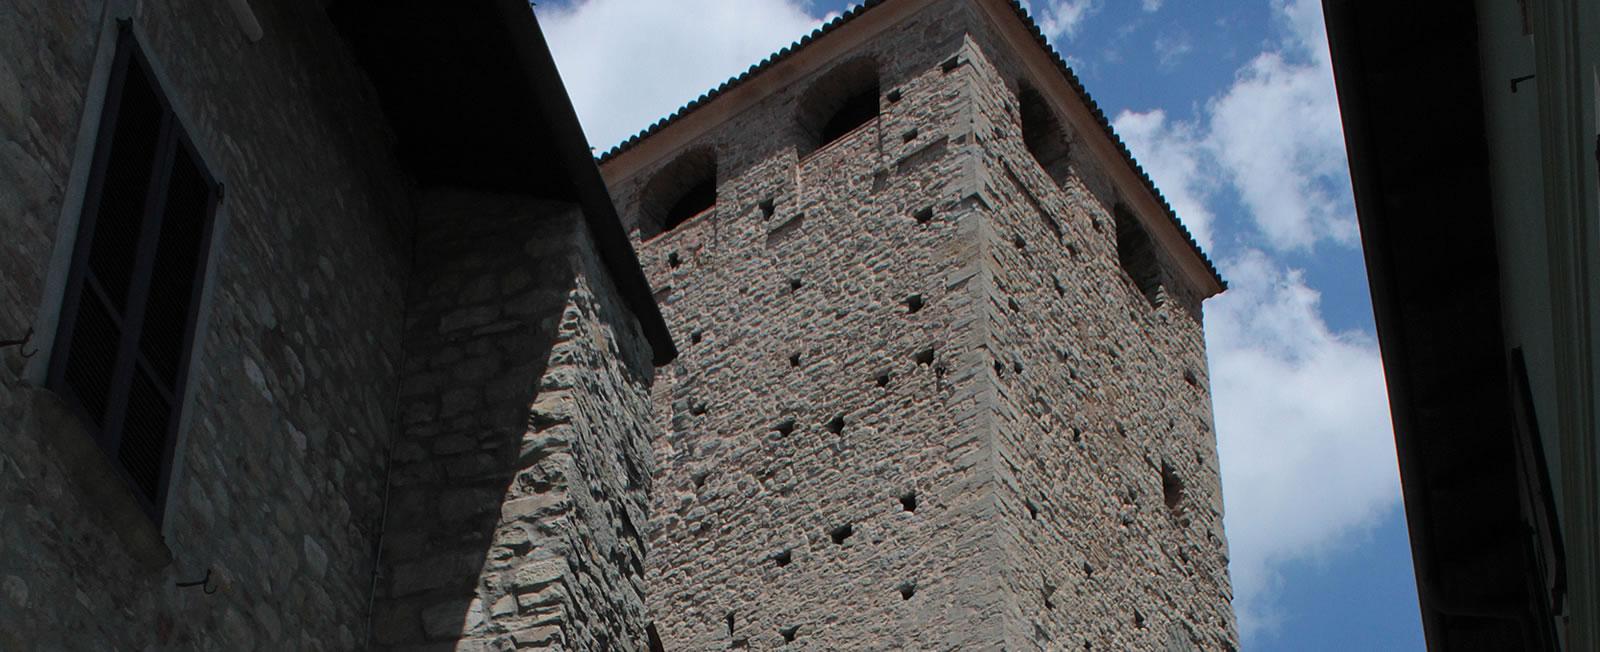 castello malaspina a varzi